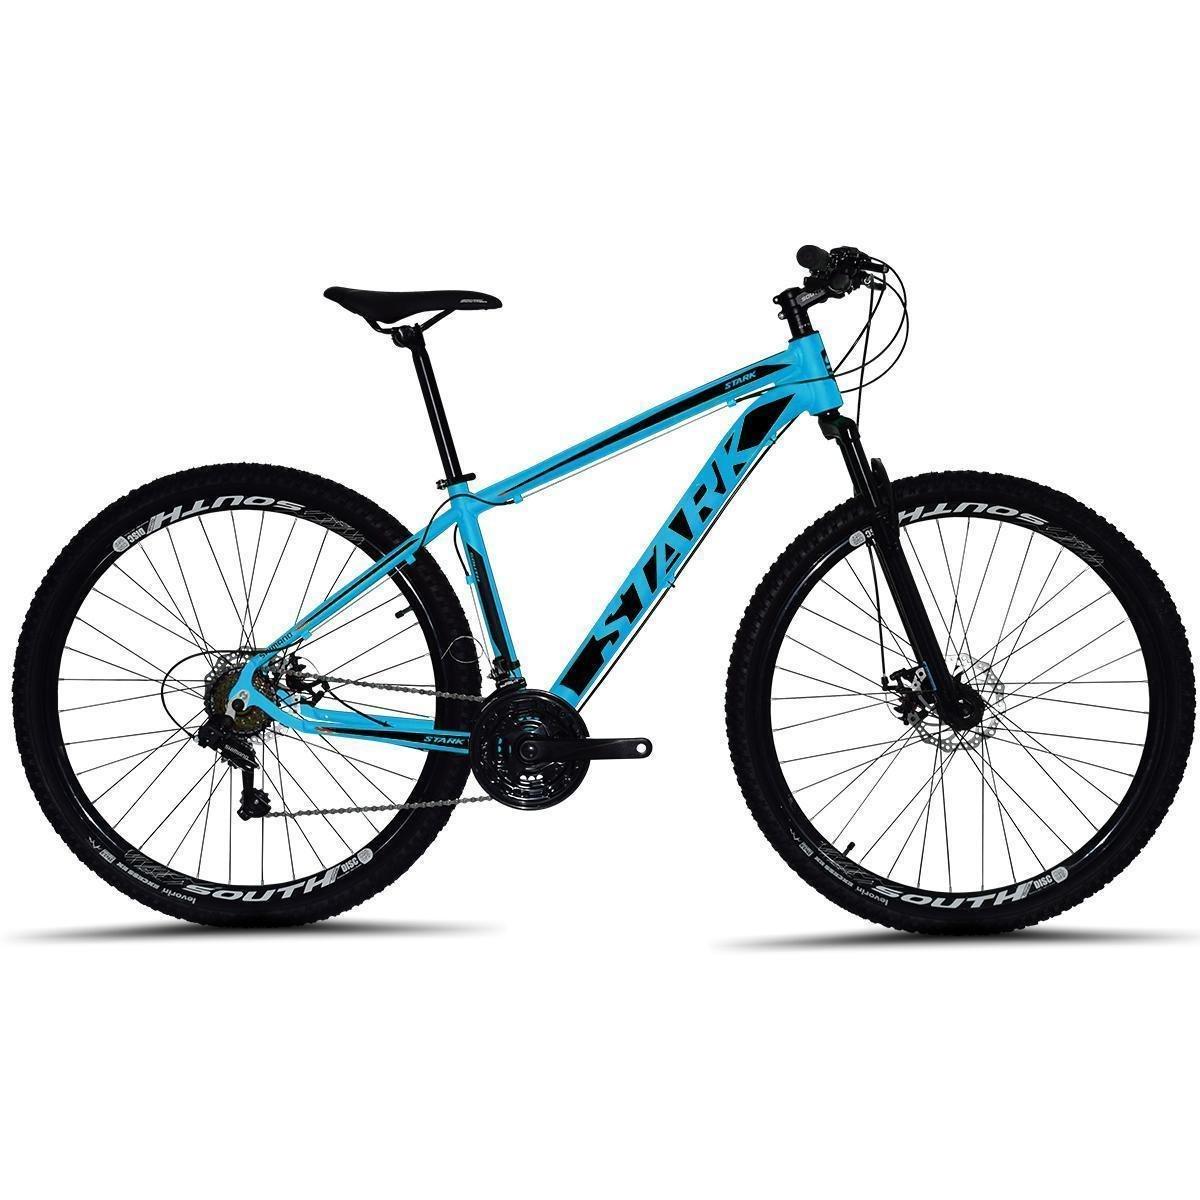 Bicicleta South Stark